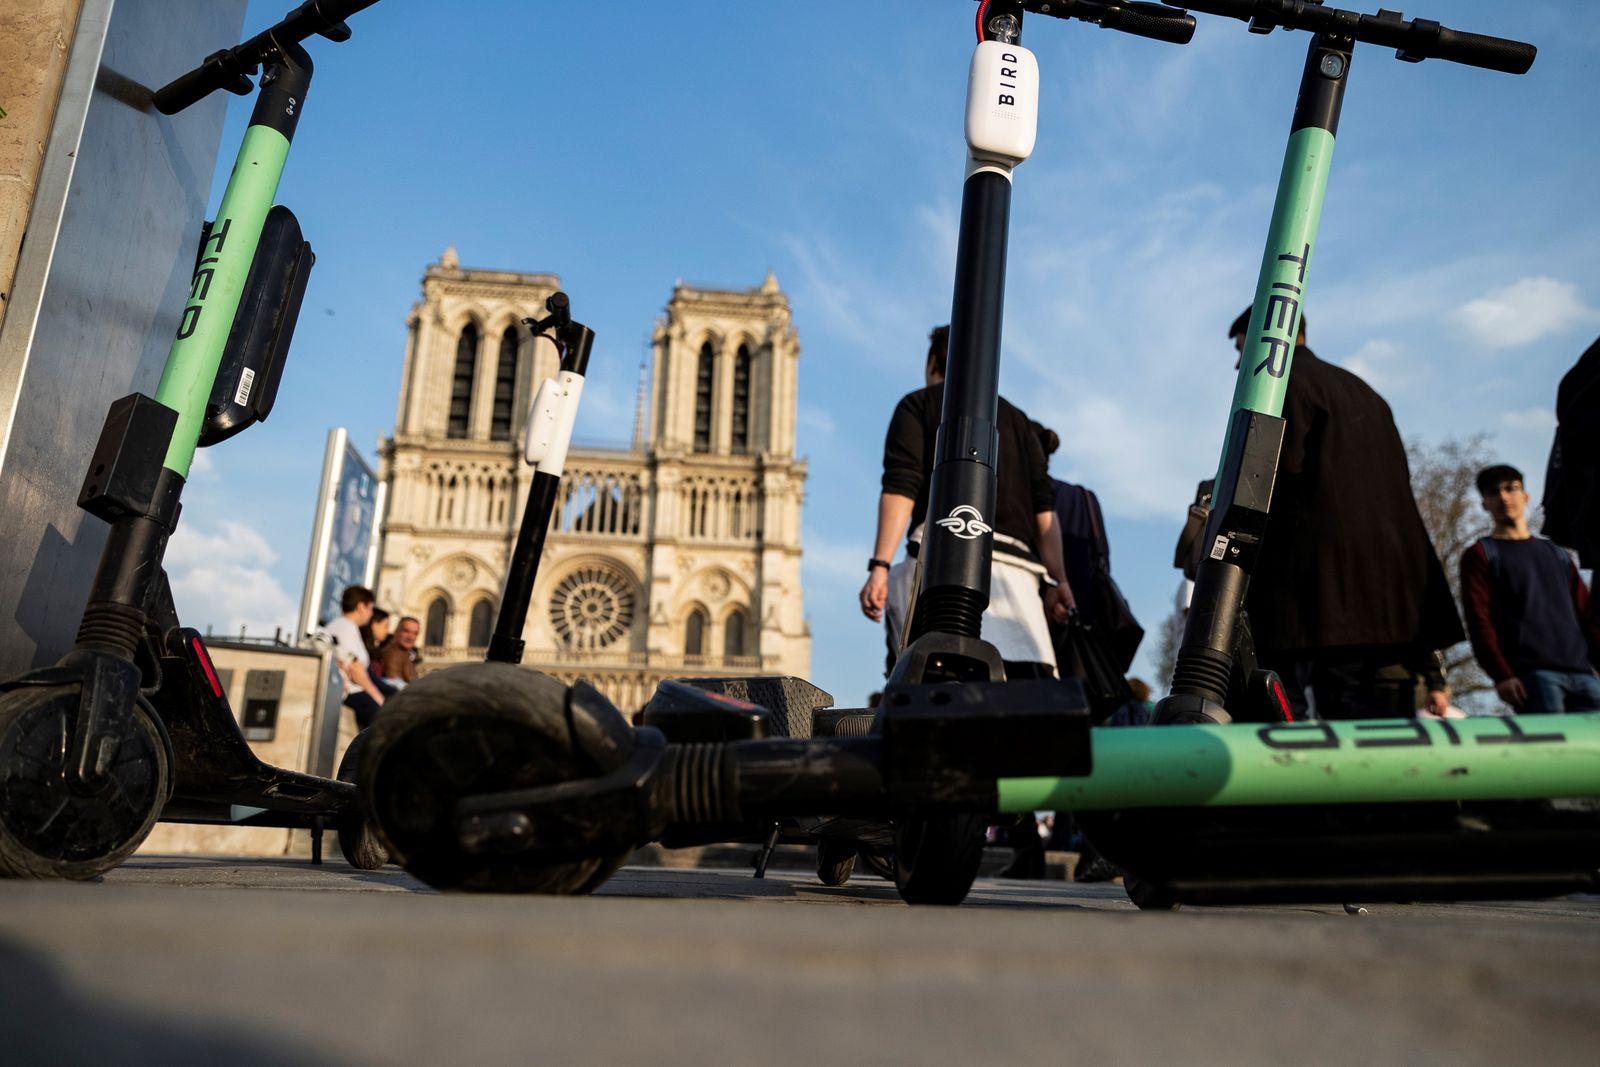 Electric scooters Paris